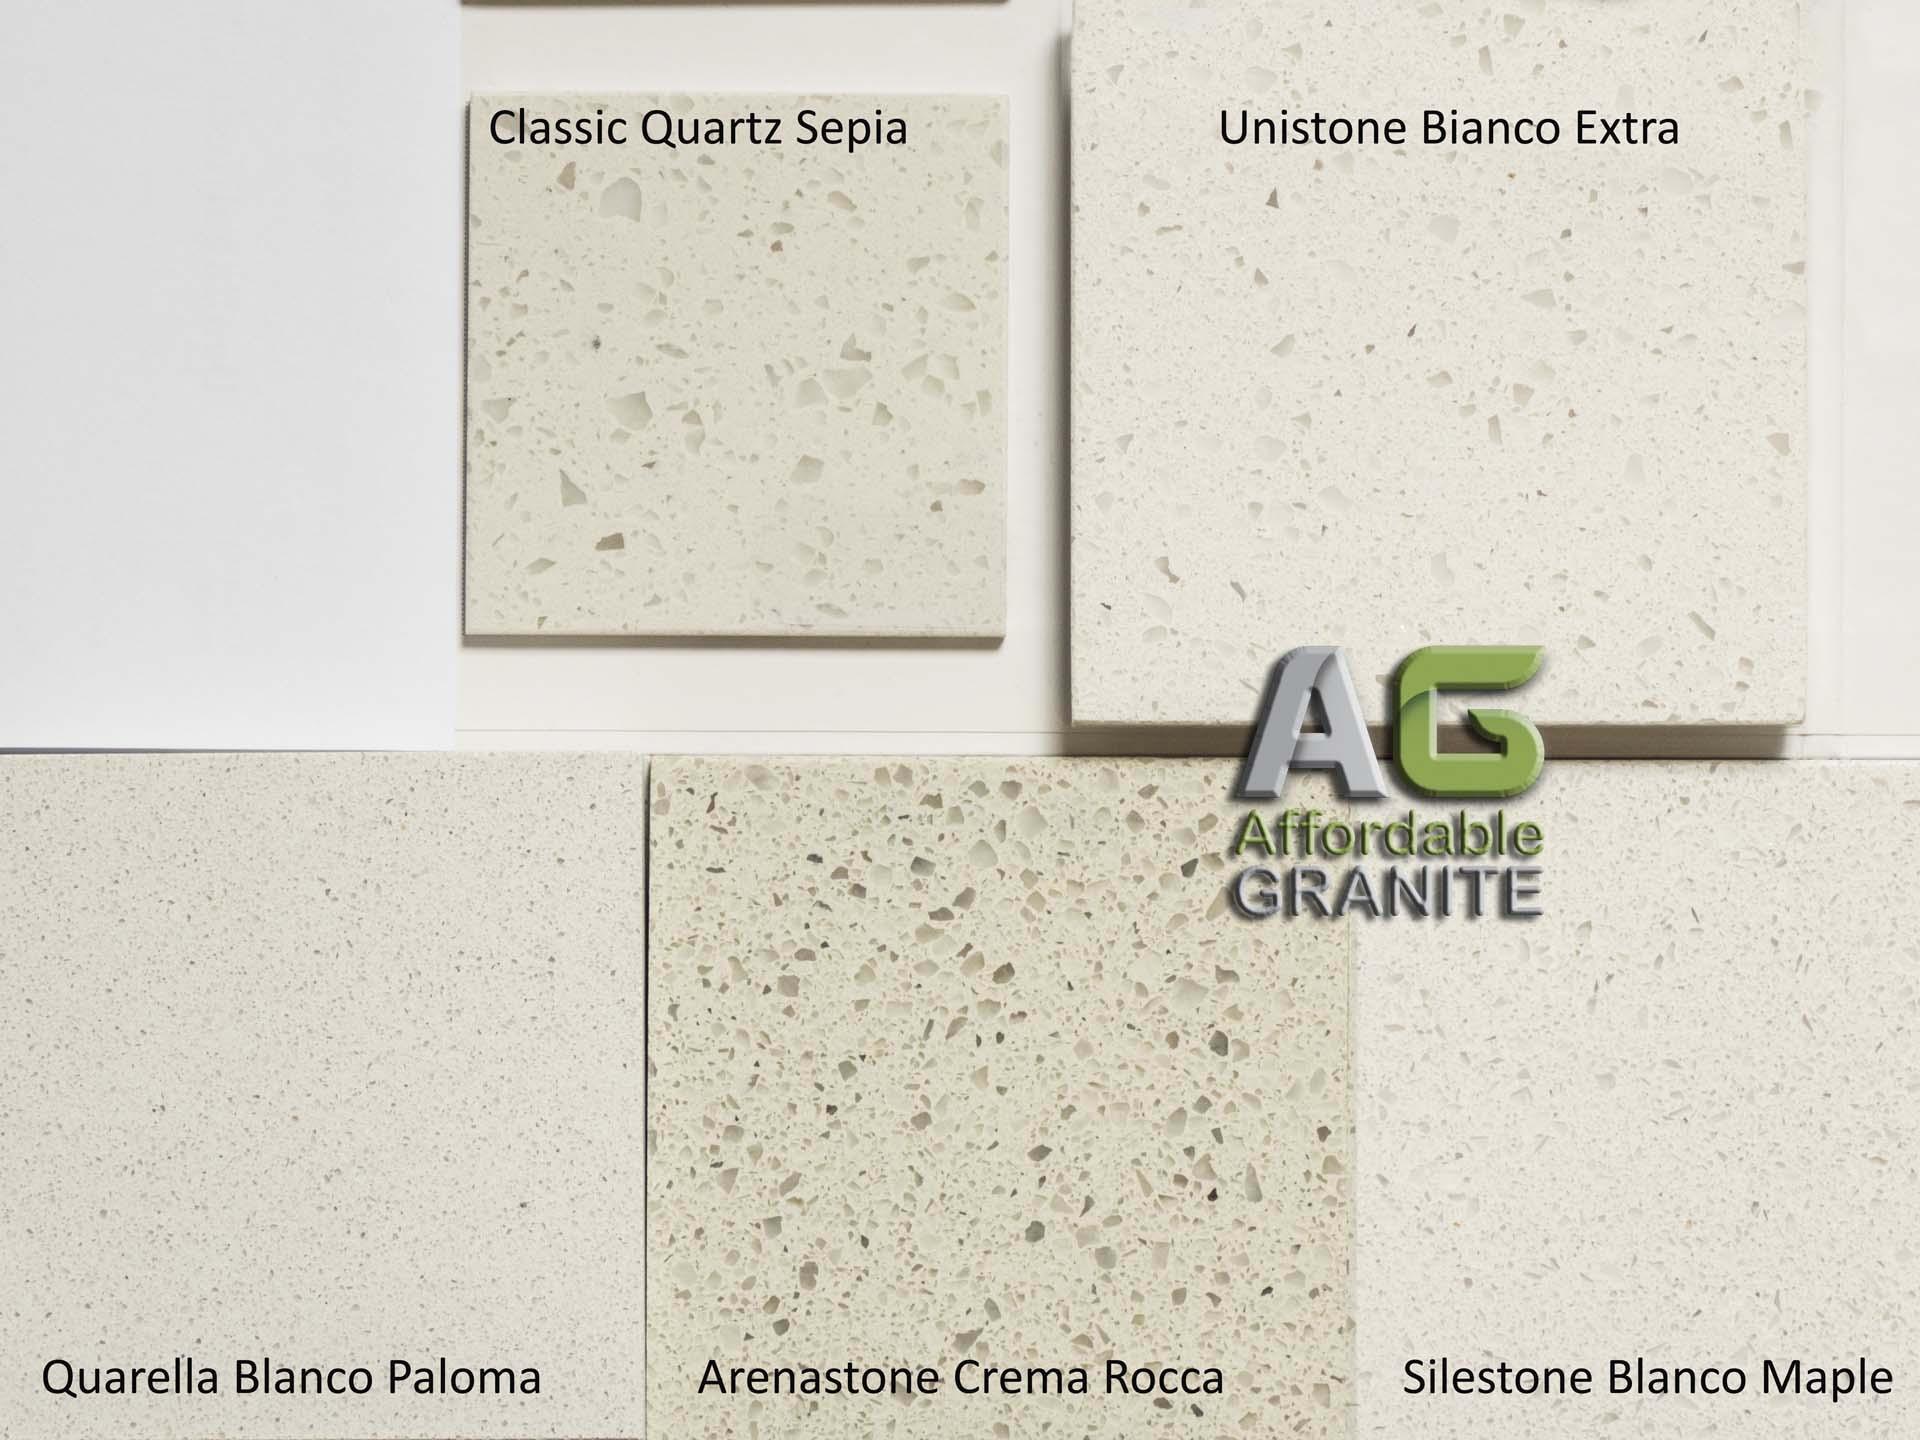 classic quartz sepia unistone bianco extra quarella blanco paloma arenastone crema rocca silestone blanco maple